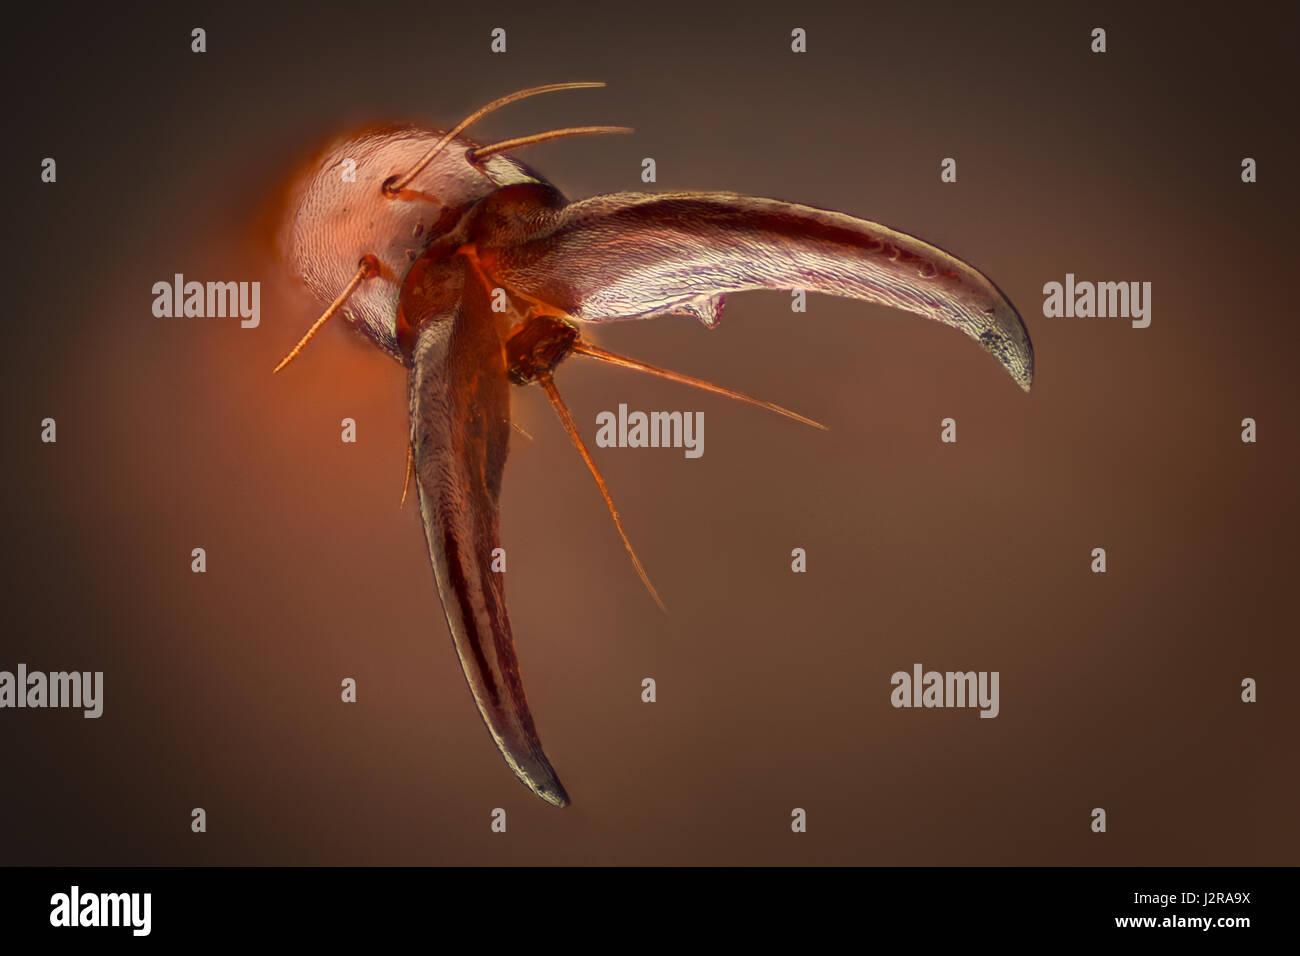 Extreme magnification - Amphimallon caucasicum beetle claw - Stock Image